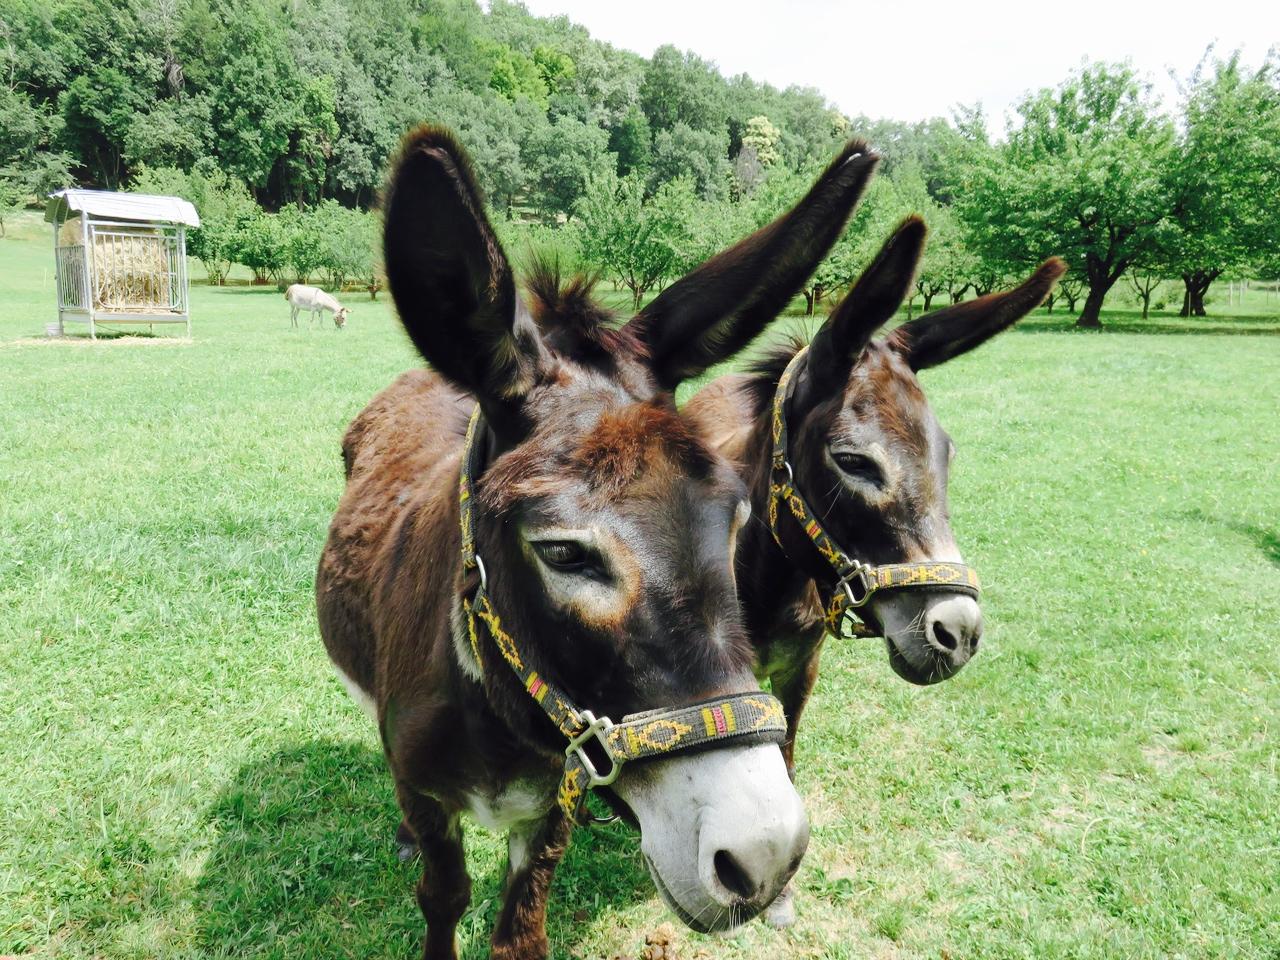 Ciuco Raduno, Parco Rurale San Floriano, Polcenigo, Friuli-Venezia Giulia, donkey, asini, turismo lento, ecoturismo